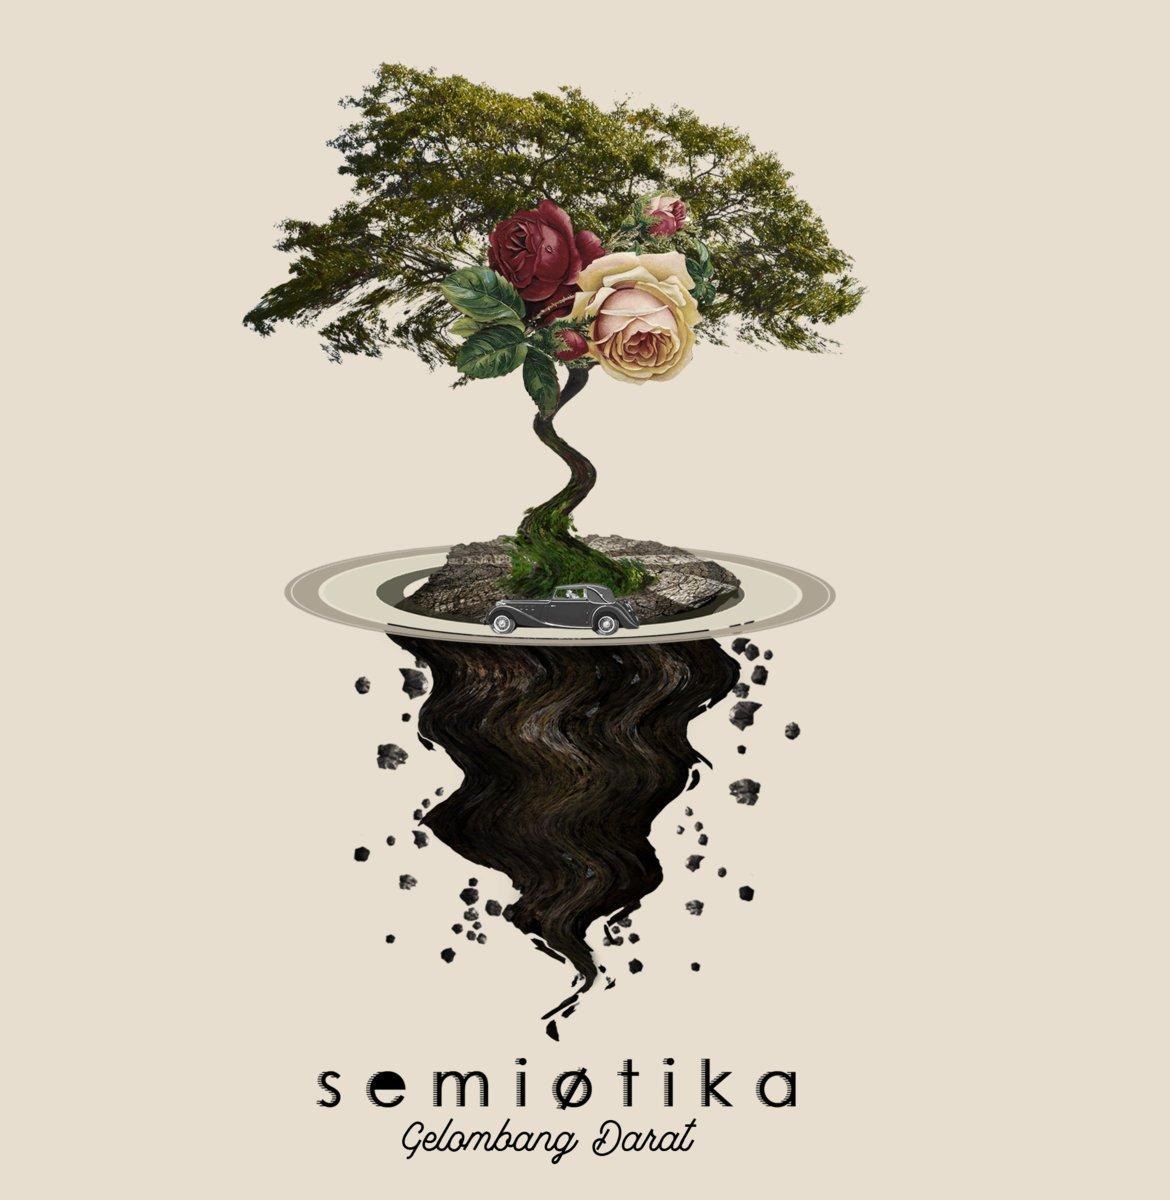 Semiotika musik